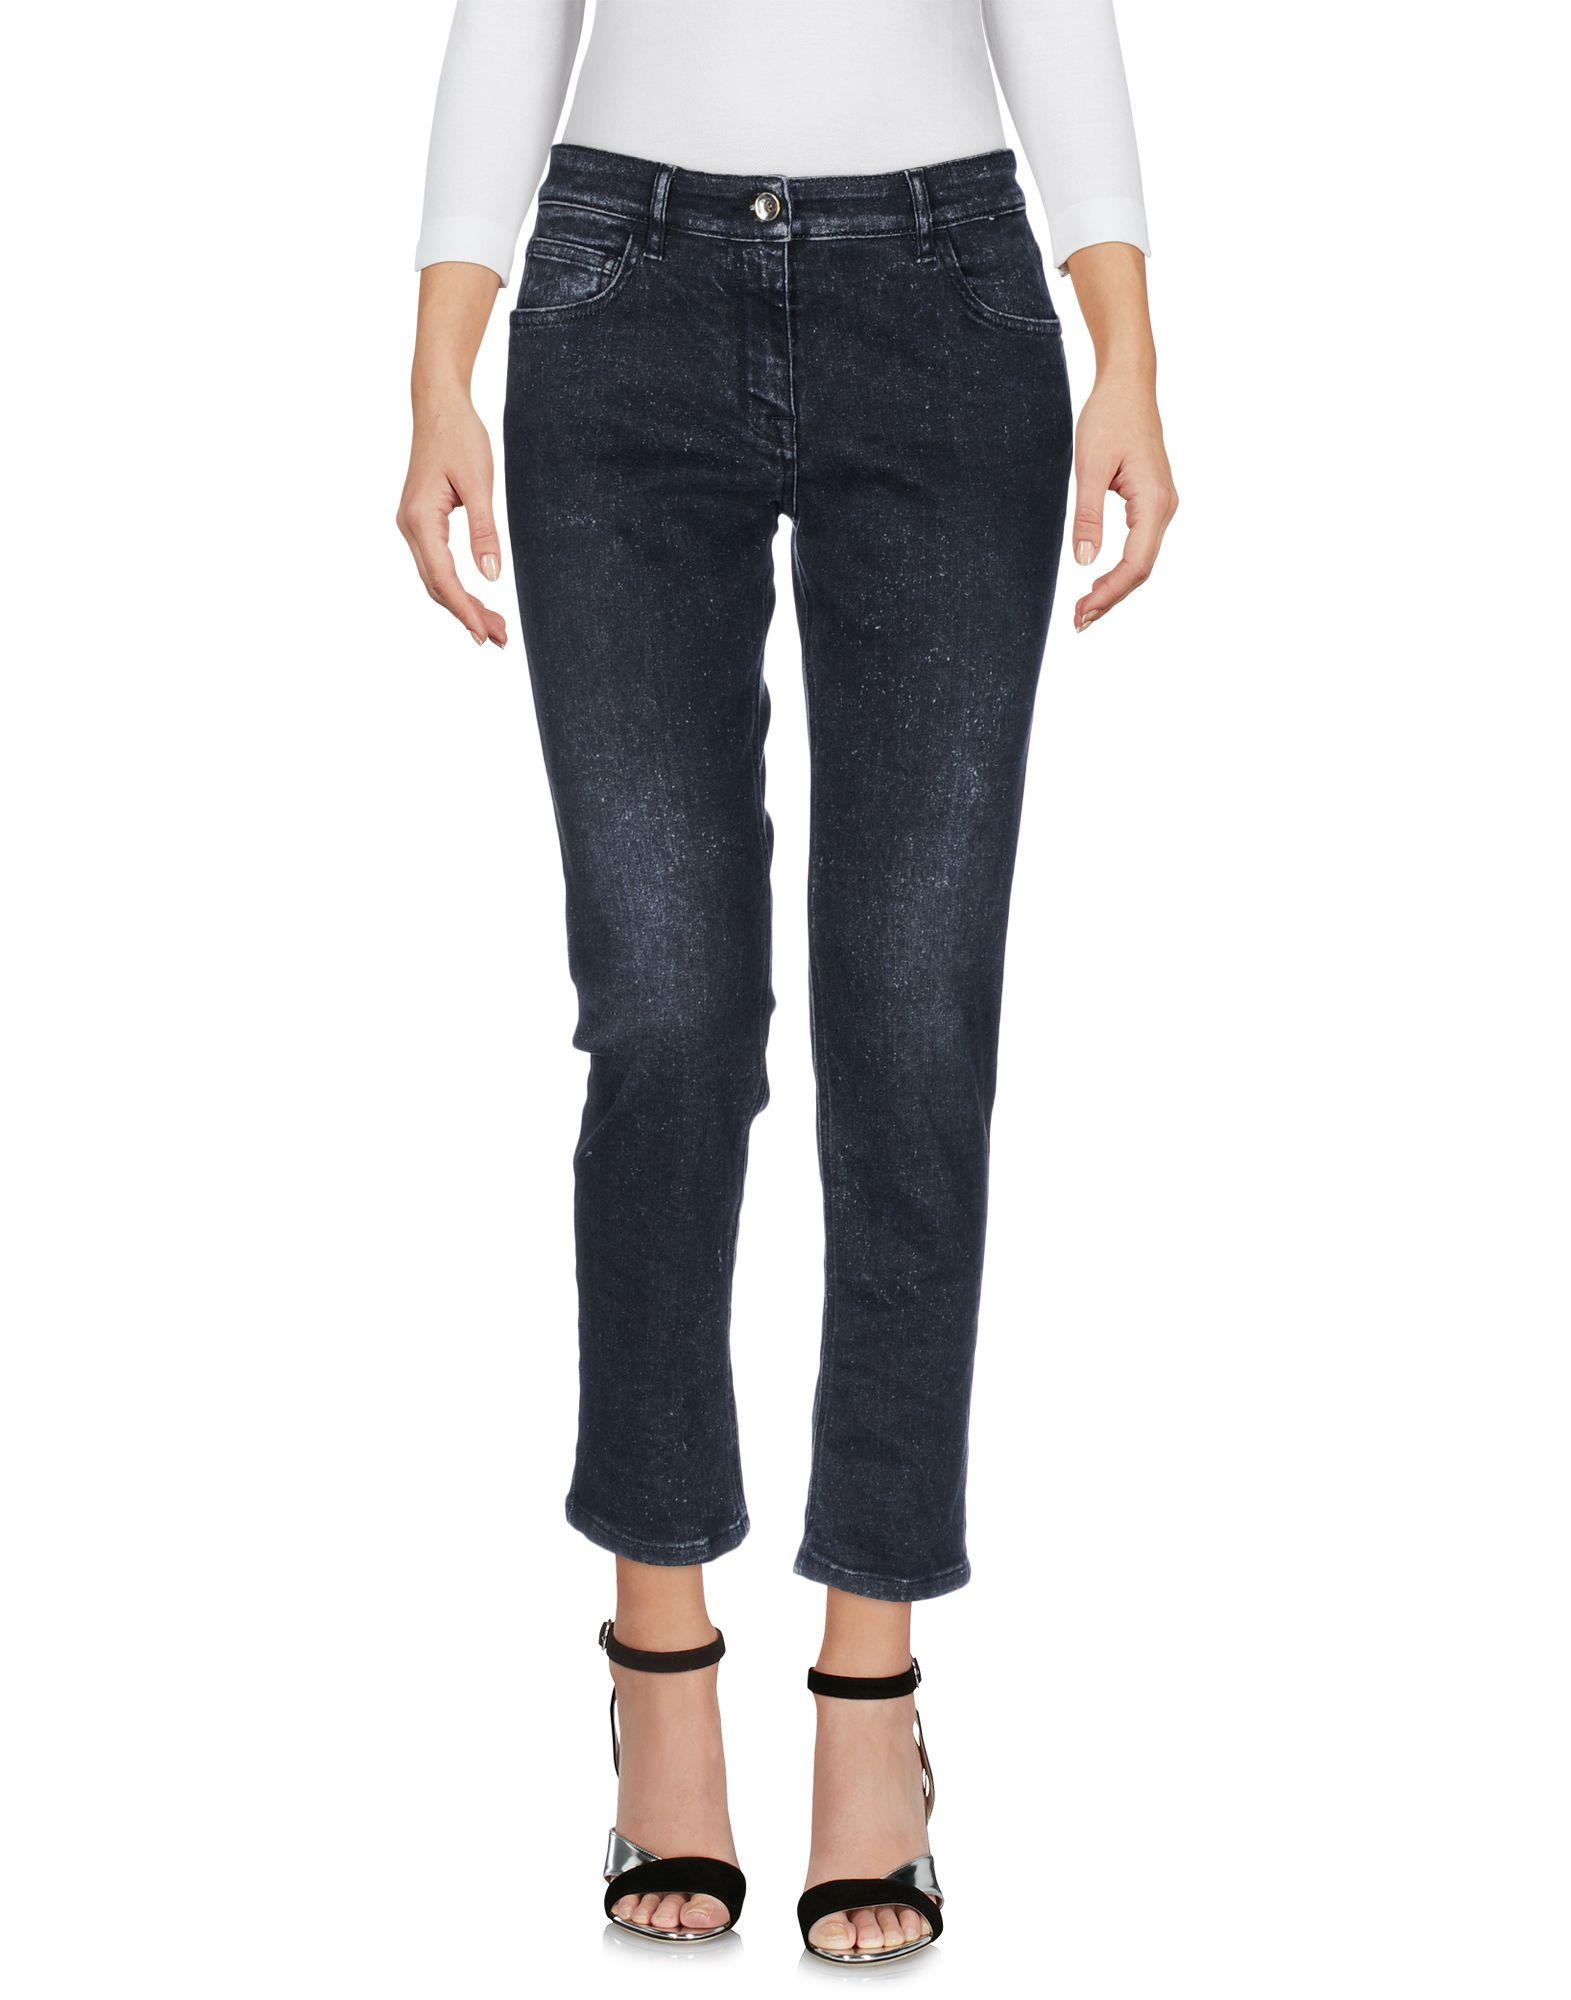 ФОТО patrizia pepe джинсовые брюки